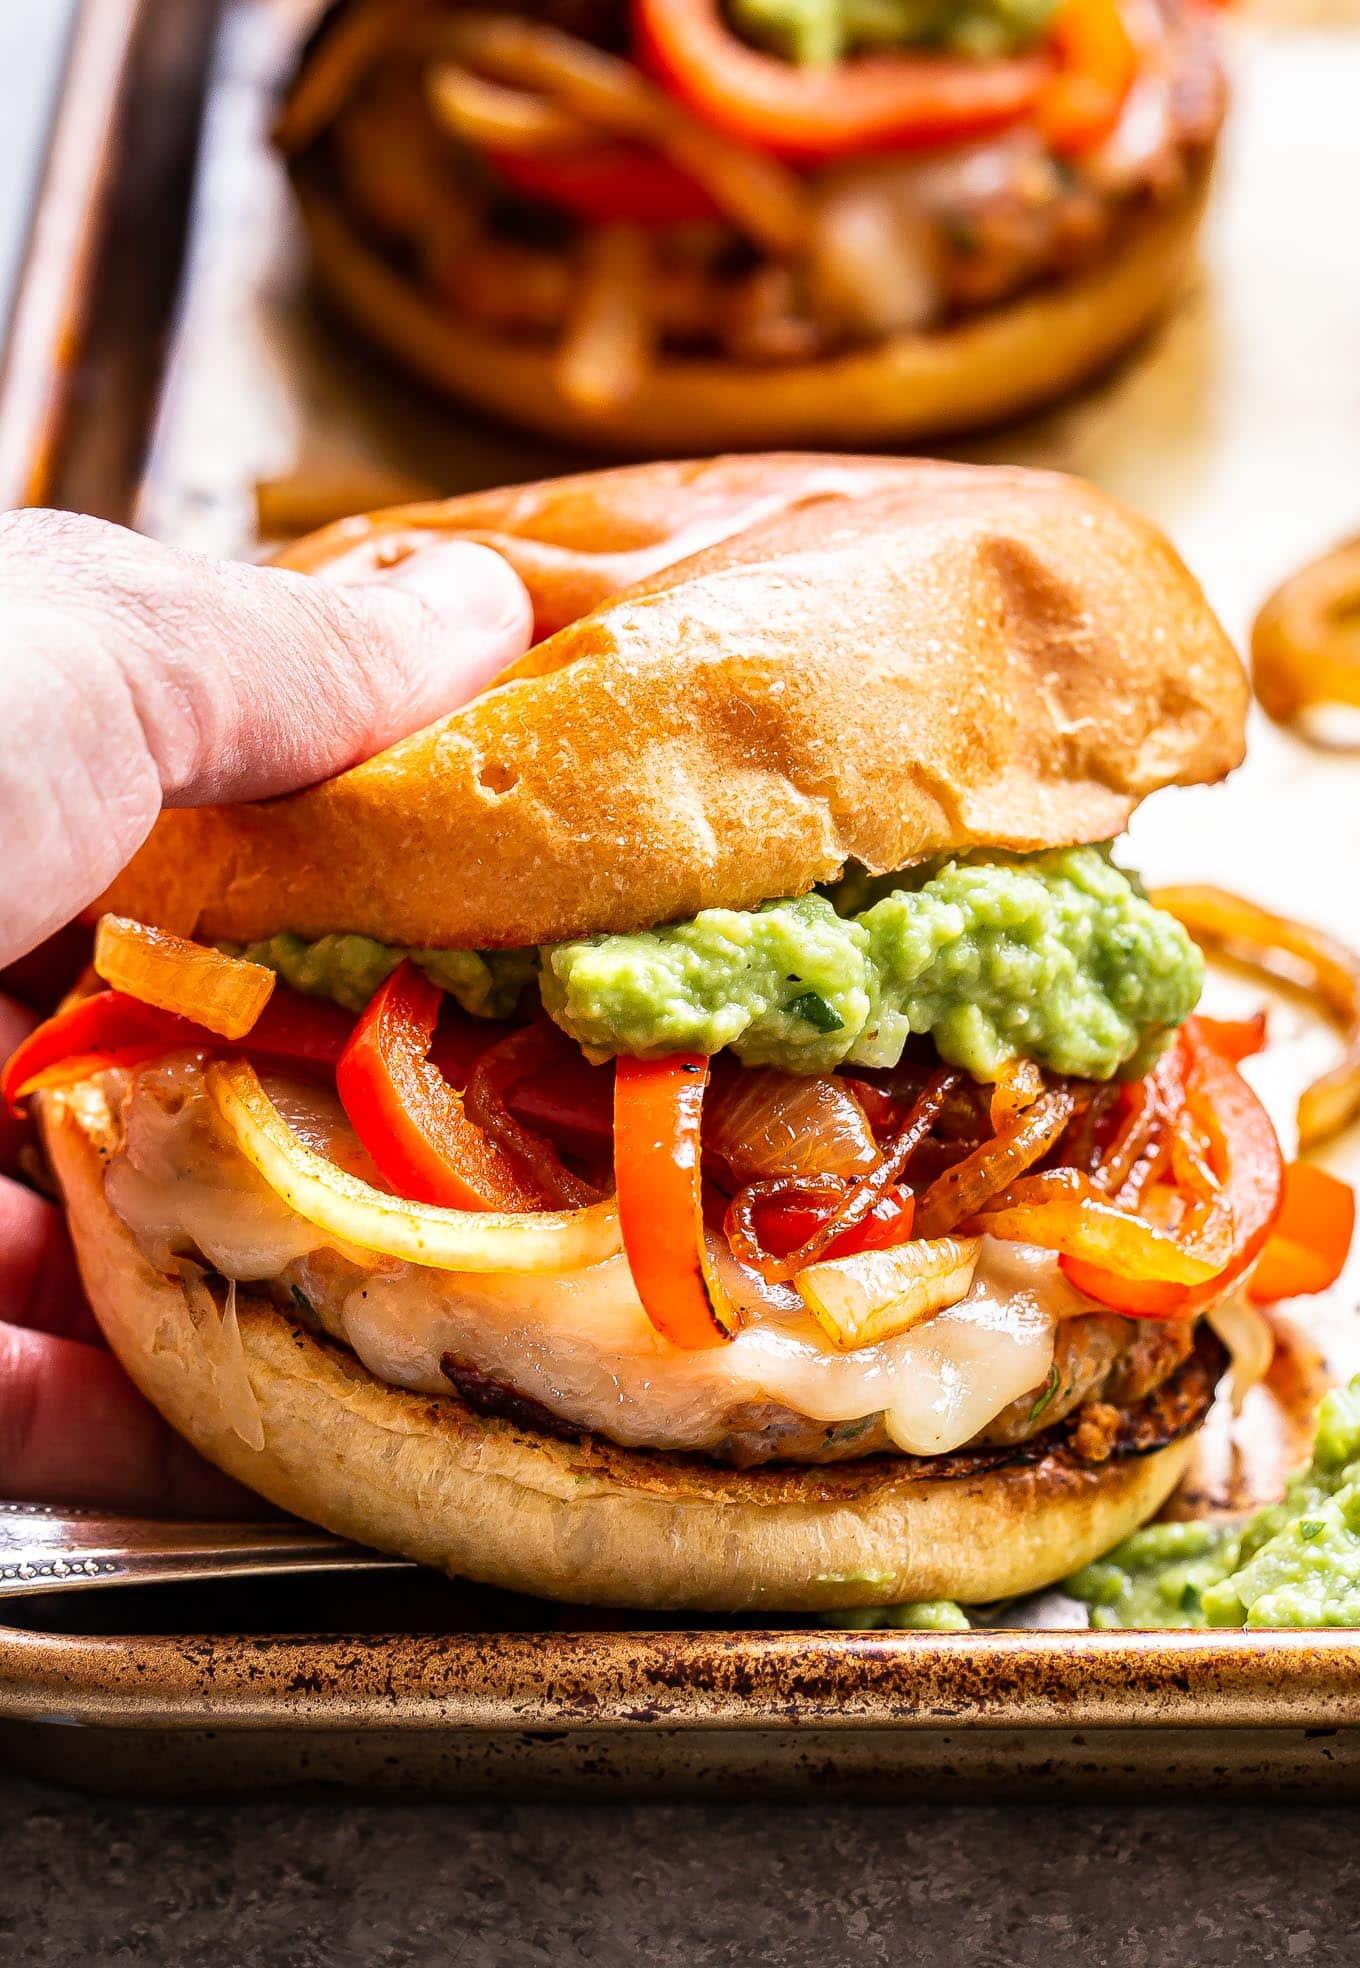 Hand picking up a Chicken Fajita Burger.